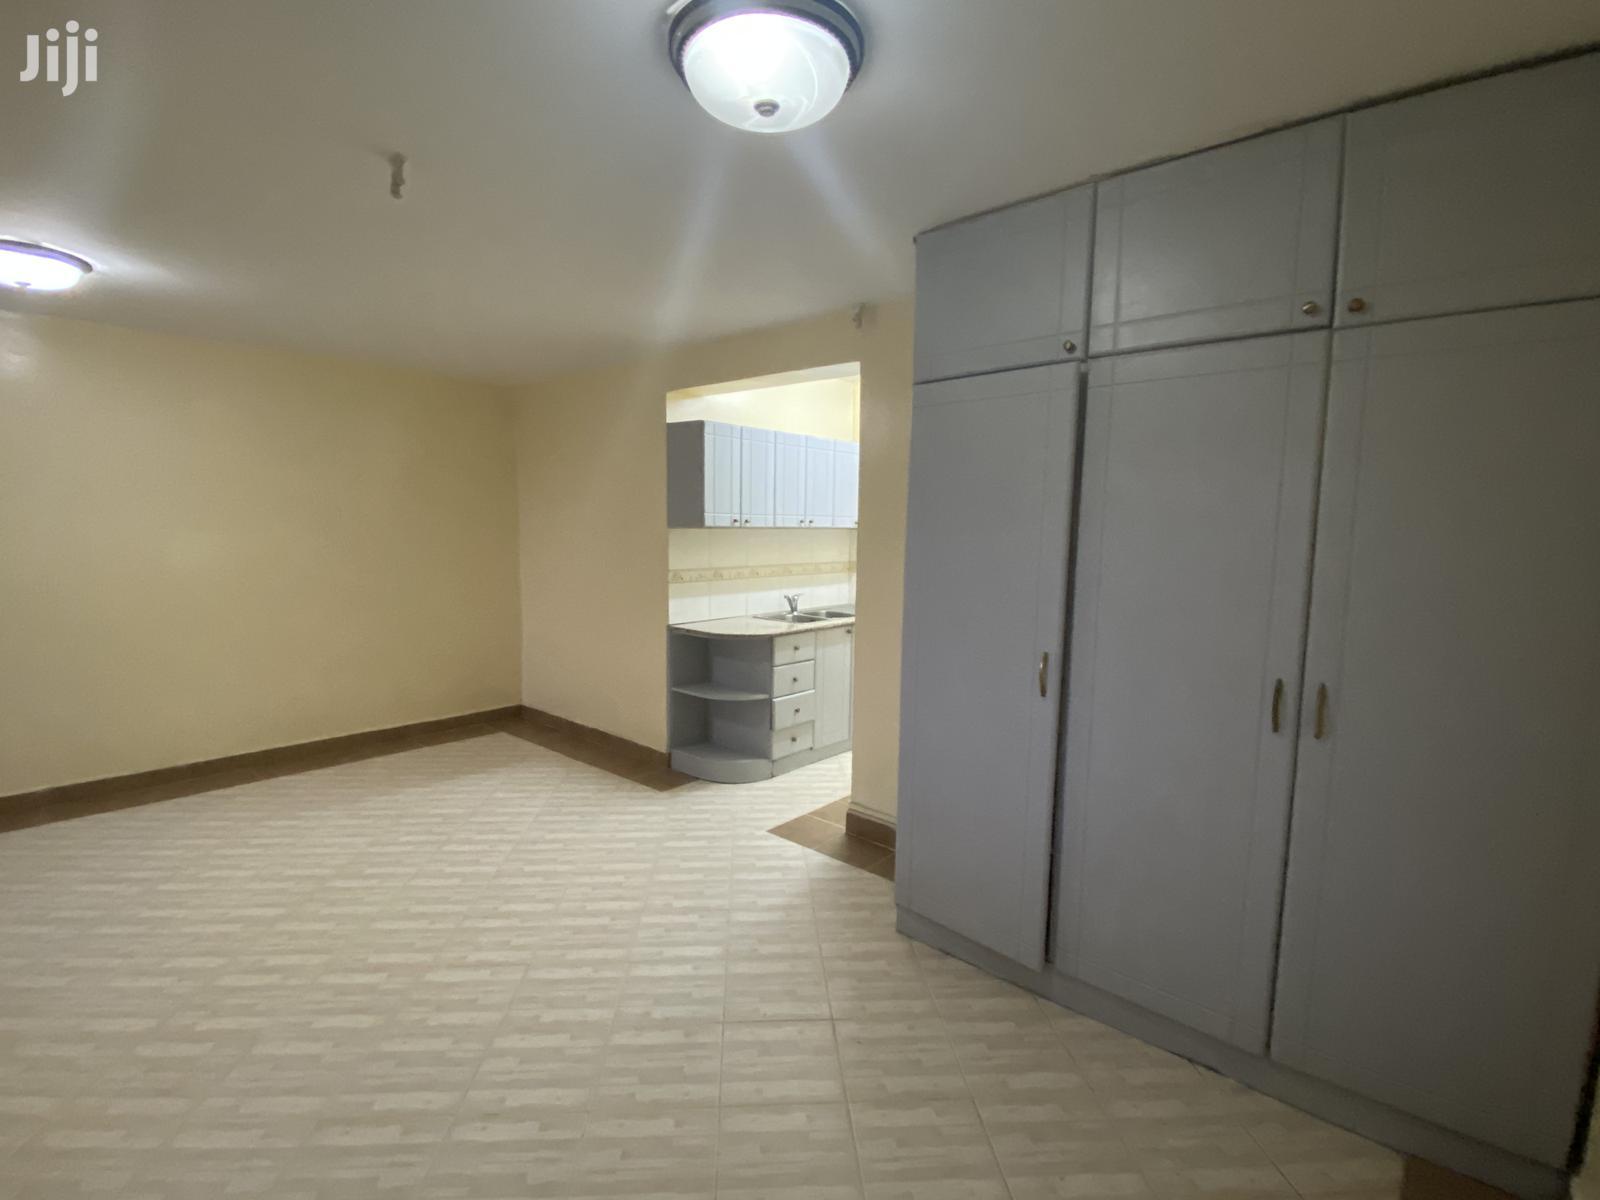 Charming Open Plan 1 Bedroom/Studio to Let in Kileleshwa | Houses & Apartments For Rent for sale in Kileleshwa, Nairobi, Kenya